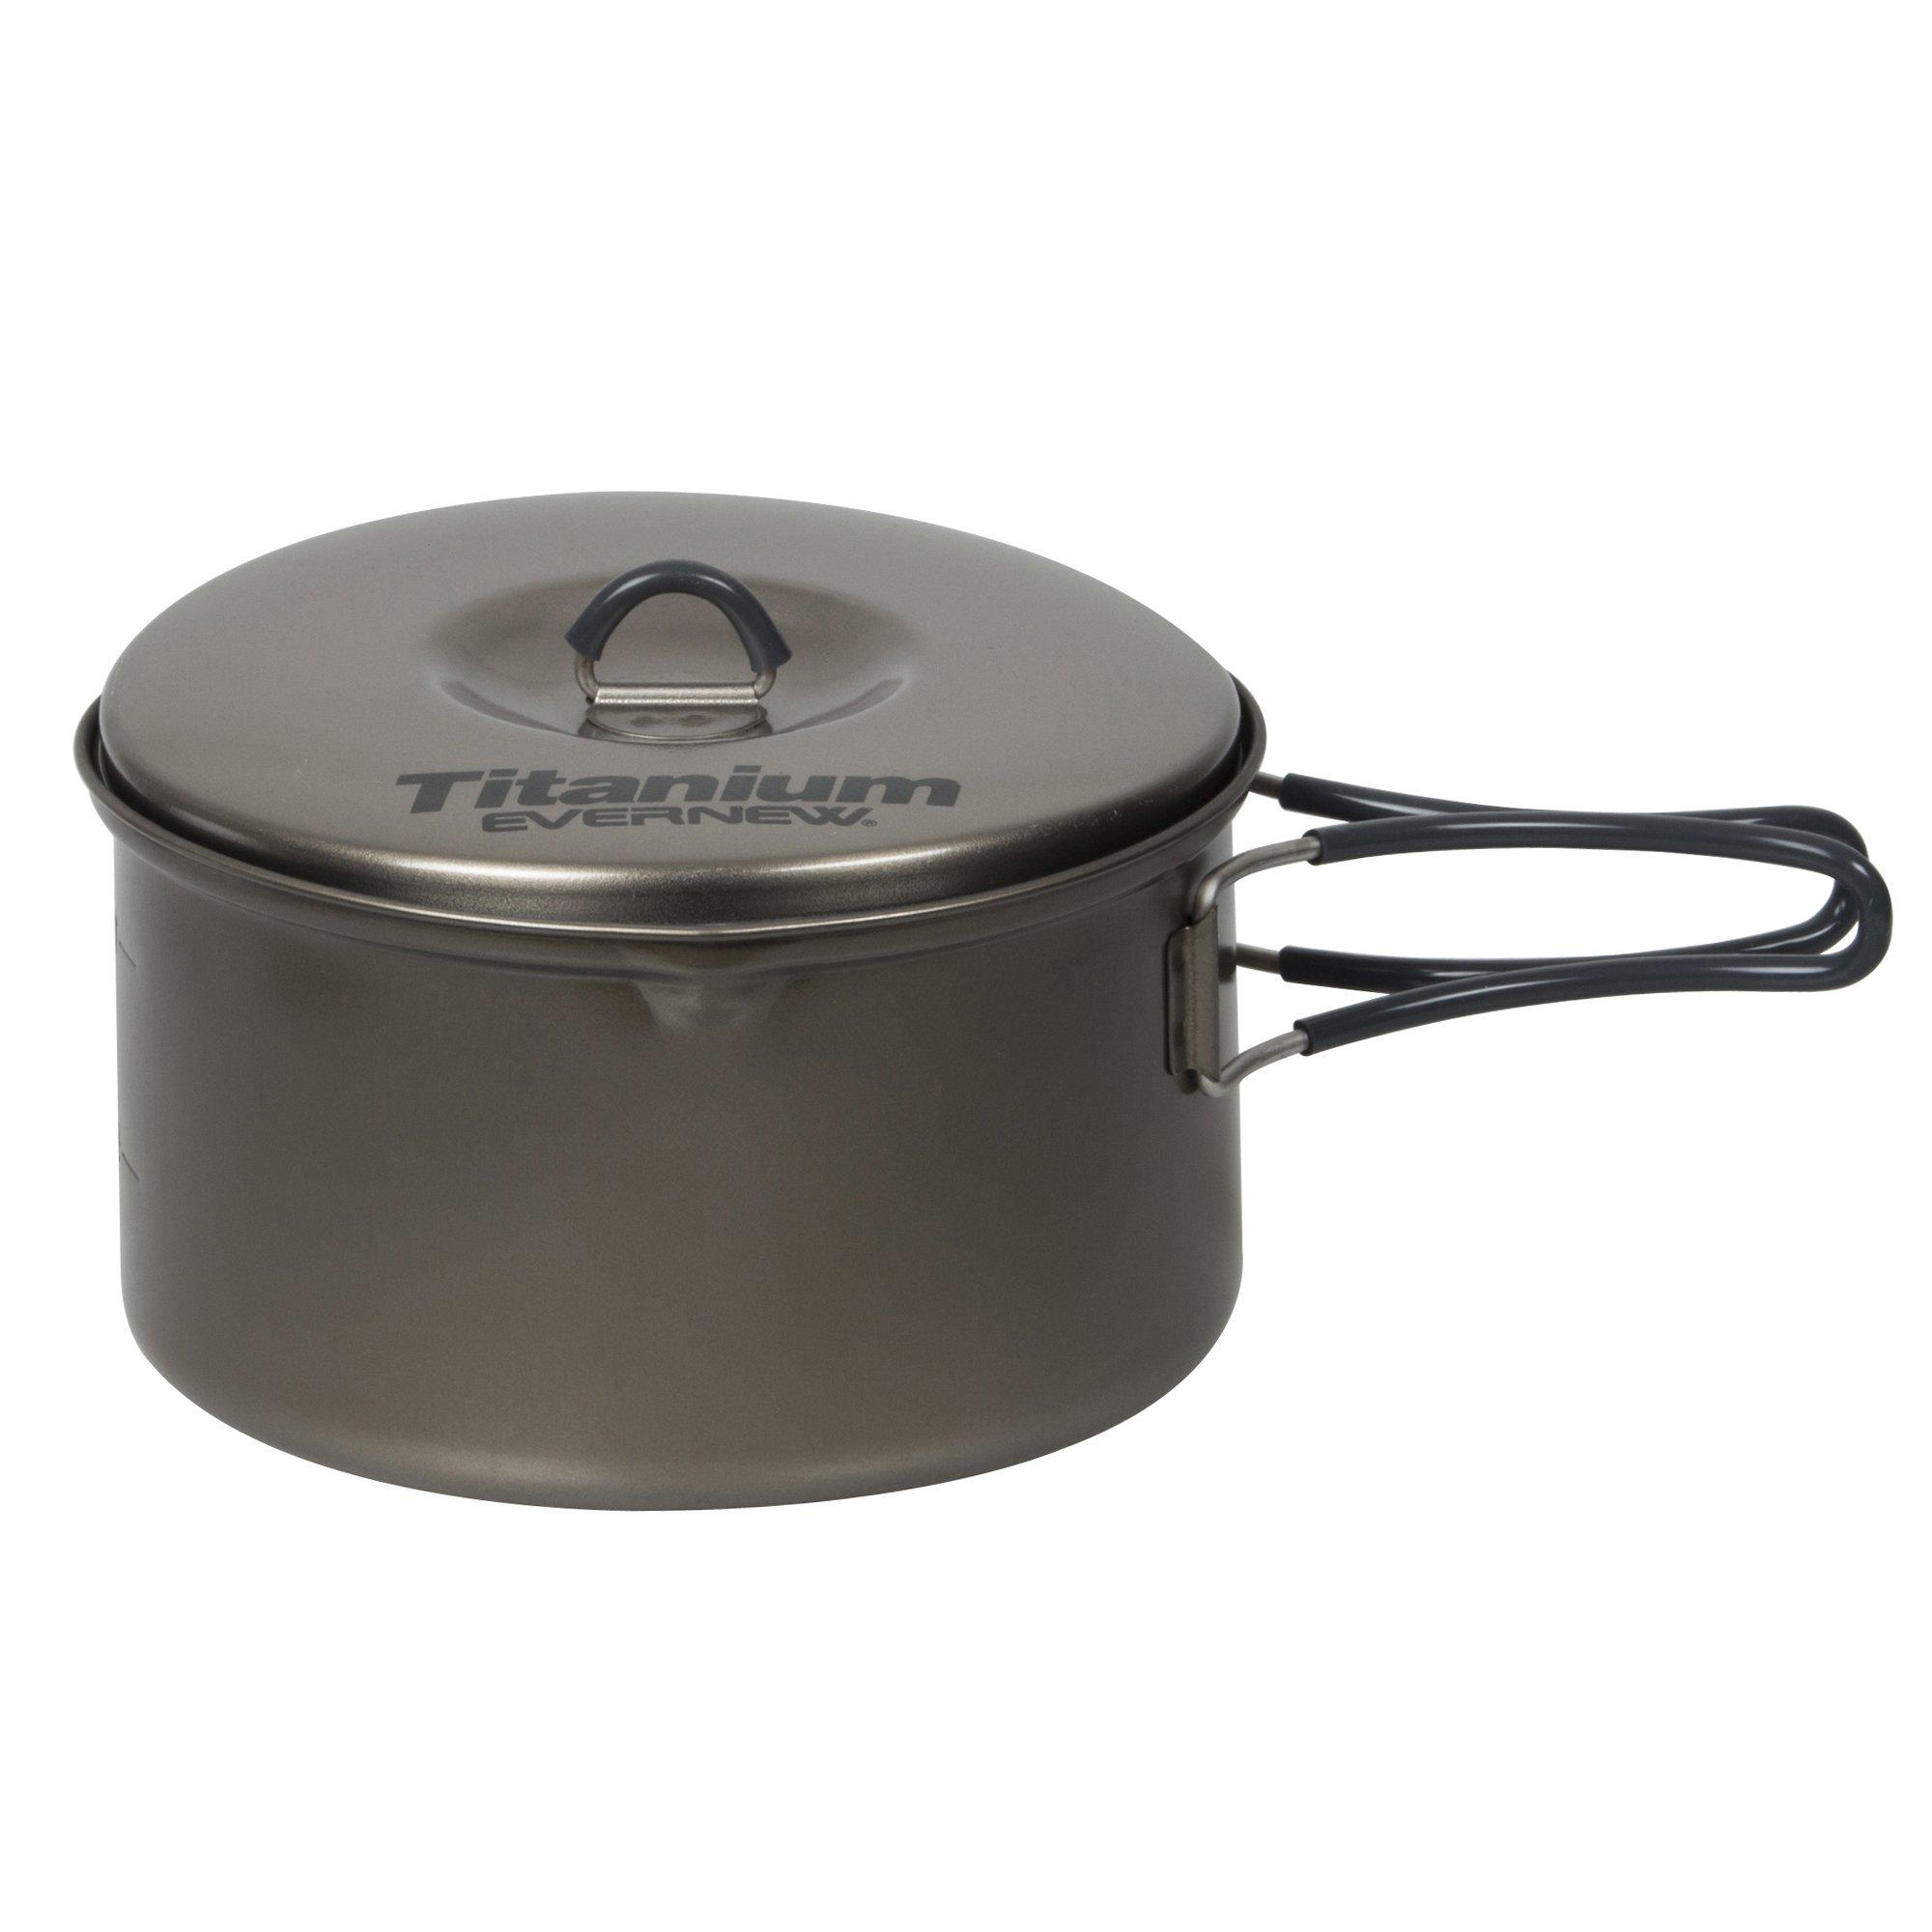 Evernew Titanium Non-Stick Pot, 1.3-Liter by EVERNEW